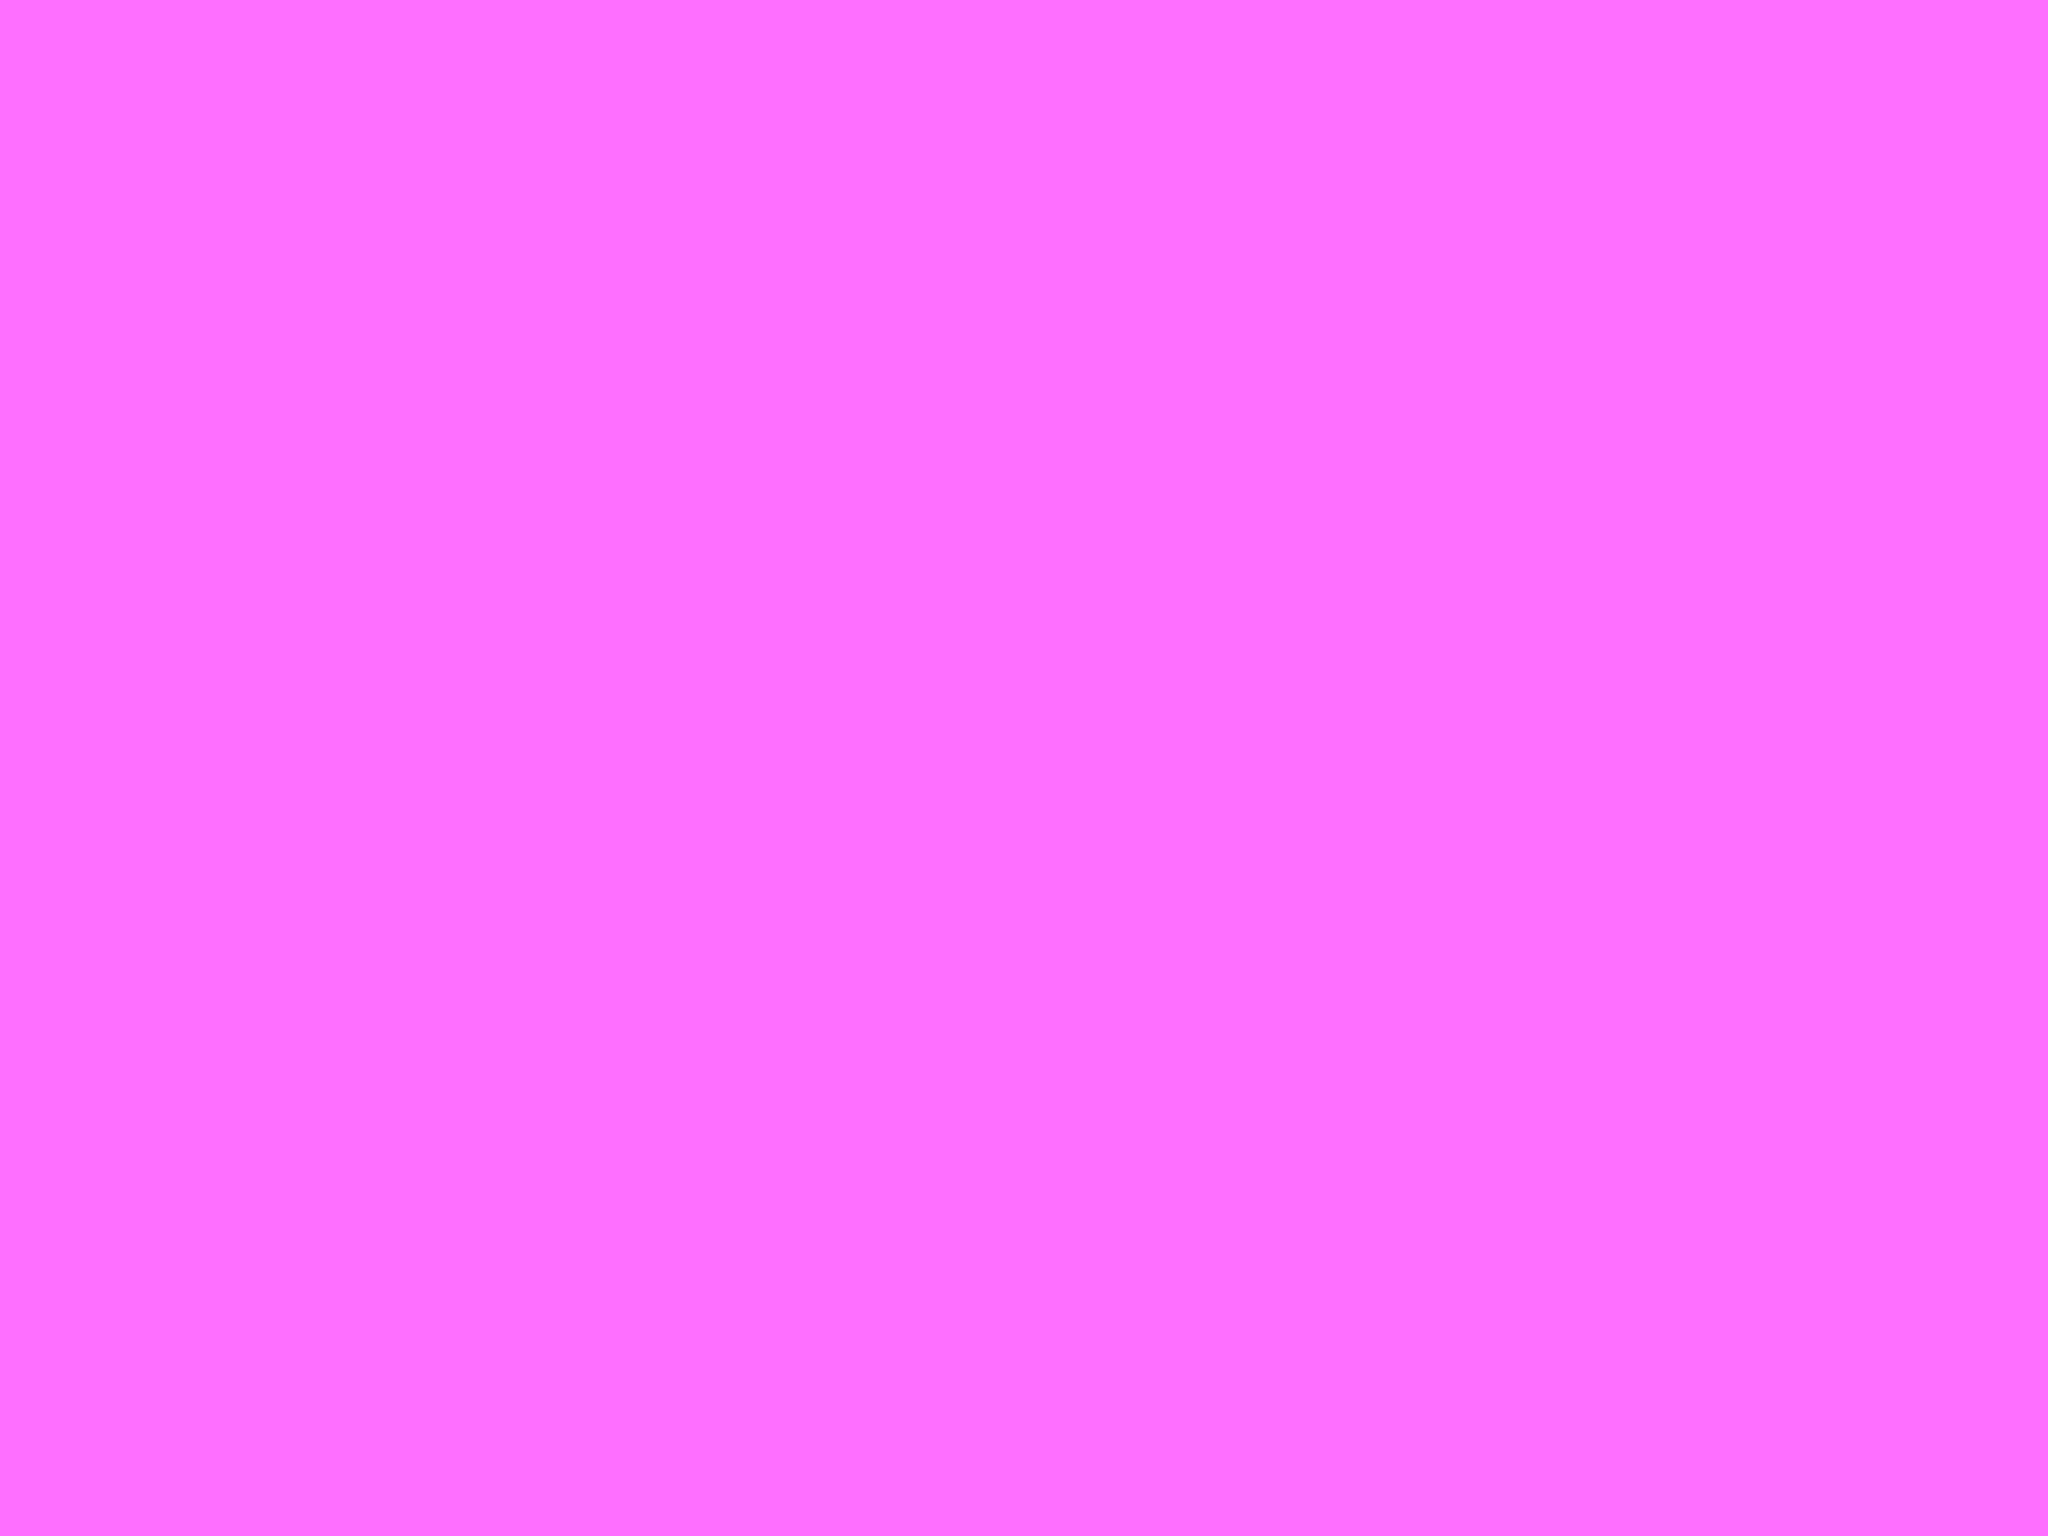 Color Your World Shocking Pink Tourmaline